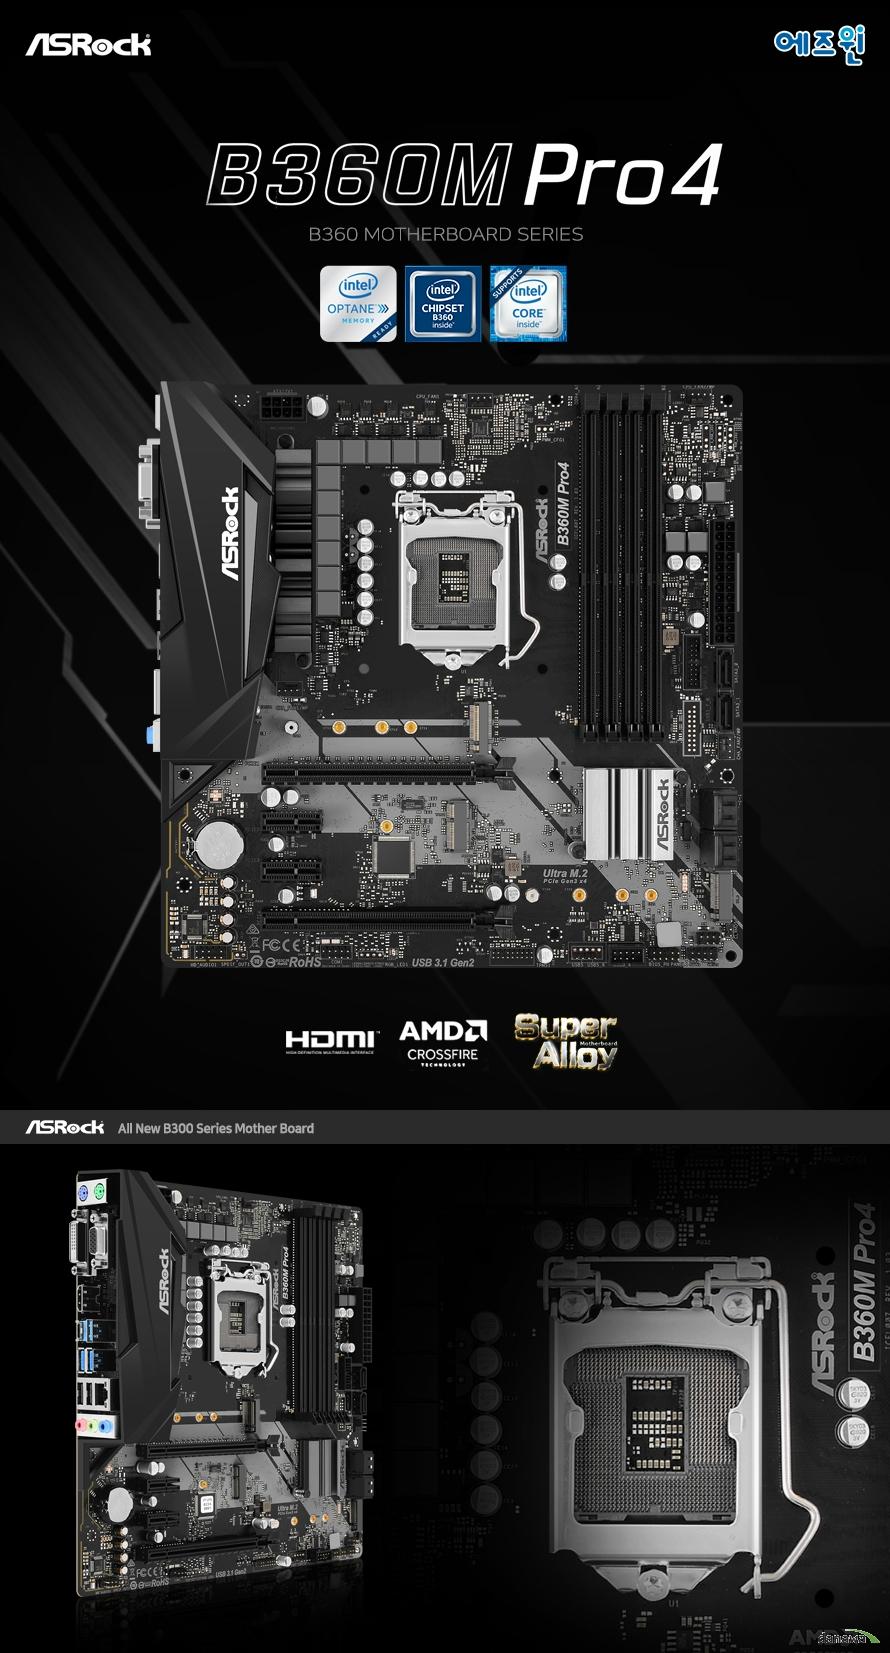 ASROCK B360M PRO4  8세대 인텔 프로세서 지원 LGA1151소켓 인텔 터보 부스트 테크놀로지 2.0 지원  인텔 B360 칩셋 지원  듀얼채널 DDR4 DIMM 메모리 지원 최대 64GB 메모리 지원 DDR4 2666 2400 2133 NON ECC UN BUFFERED 메모리 지원 ECC UDIMM 메모리 모듈 지원 XMP 2.0 지원  PCIE 3.0 X16 슬롯 2개  PCIE 3.0 X1 슬롯 2개 AMD 크로스 파이어 지원  인텔 i219v 기가비트 랜 지원  SATA3 커넥터 6개 지원 울트라 m.2 슬롯 1개 및 m.2 슬롯 1개 지원  USB 3.1 gen2 a+c 및 gen1 4개 , 2.0 5개 지원 리얼텍 ALC892 7.1채널 HD 오디오 코덱 지원 윈도우 10 64비트 지원   KC인증 R REM ASR B360MPRO4  제조사의 사정에 따라 사전고지 없이 일부 제품사양이 변경될 수 있으며, 더 자세한 정보는 제조사 홈페이지 또는 제품 매뉴얼을 참고해주시기 바랍니다.  제품 구성   사용자 설명서 드라이버 CD IO쉴드  최고의 고객 만족을 위하여 에즈윈 에서는 3년 무상 품질 보증 서비스를 제공합니다.